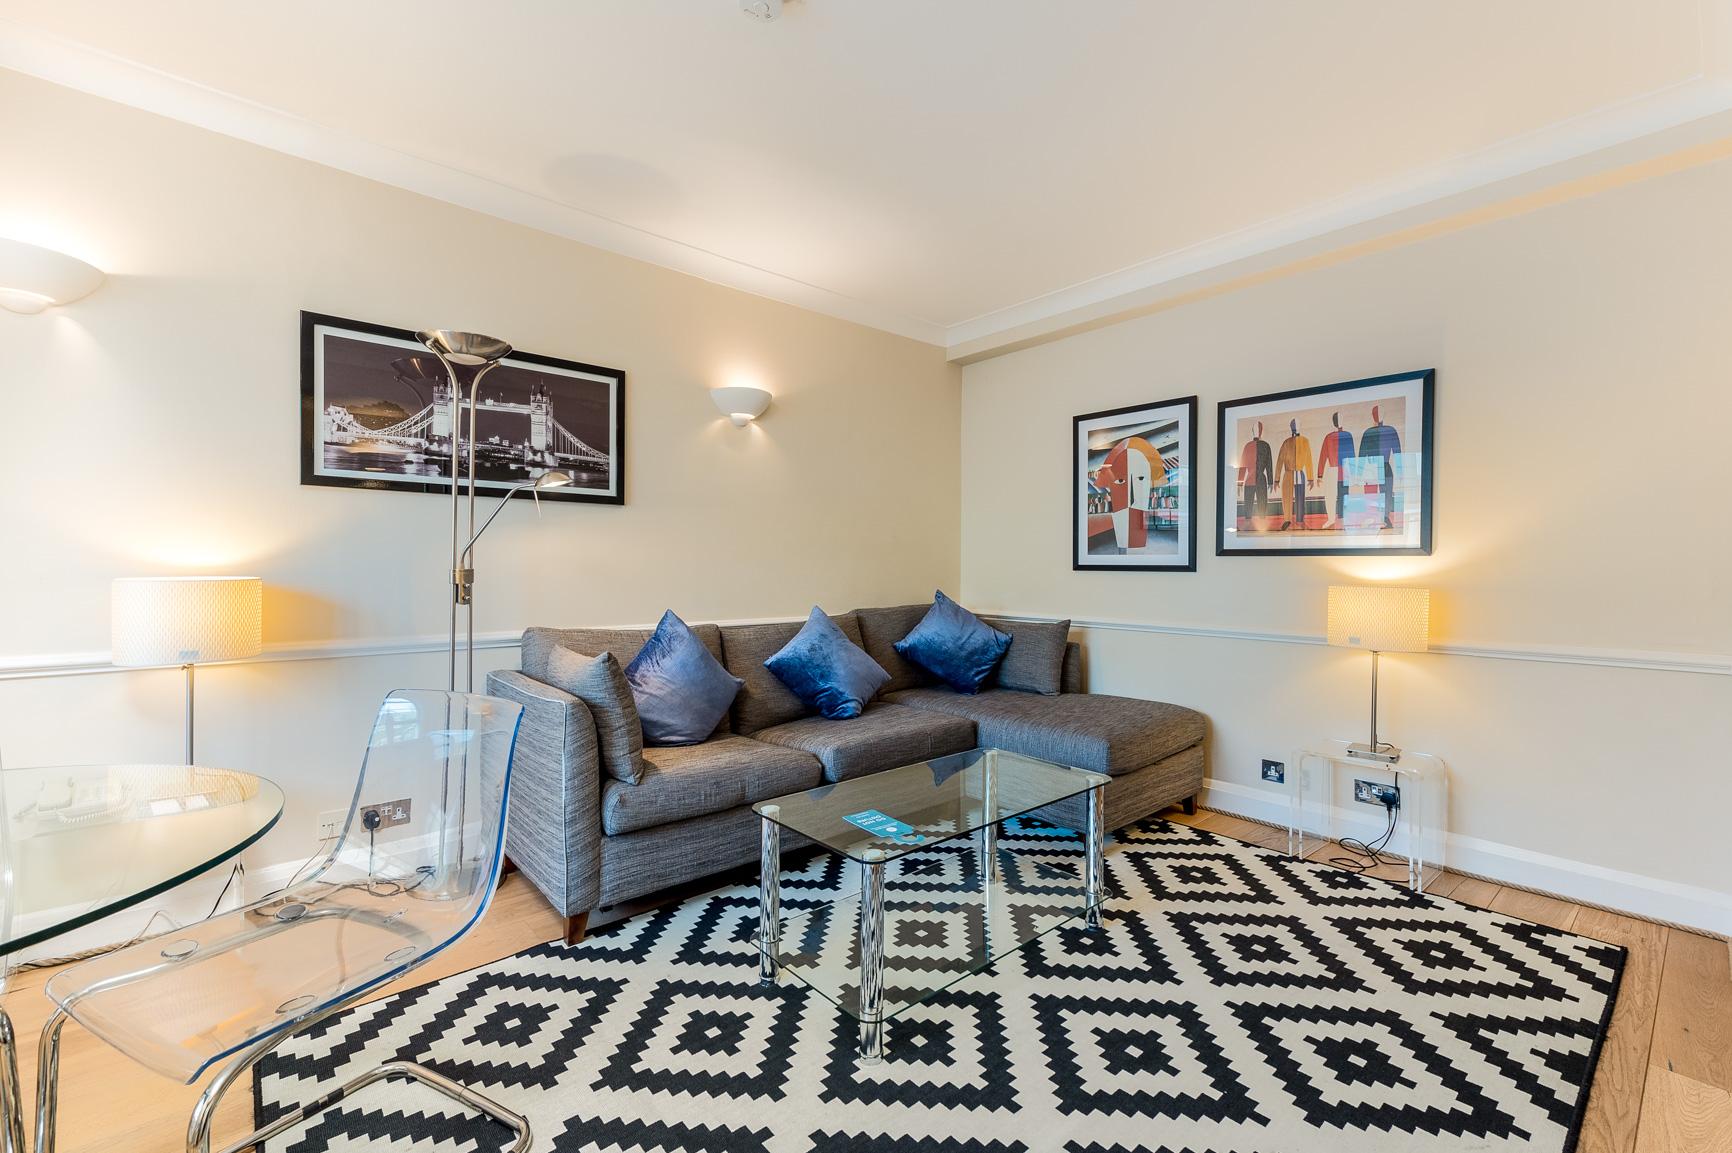 Sofa at Nell Gwynn House Accommodation, Chelsea, London